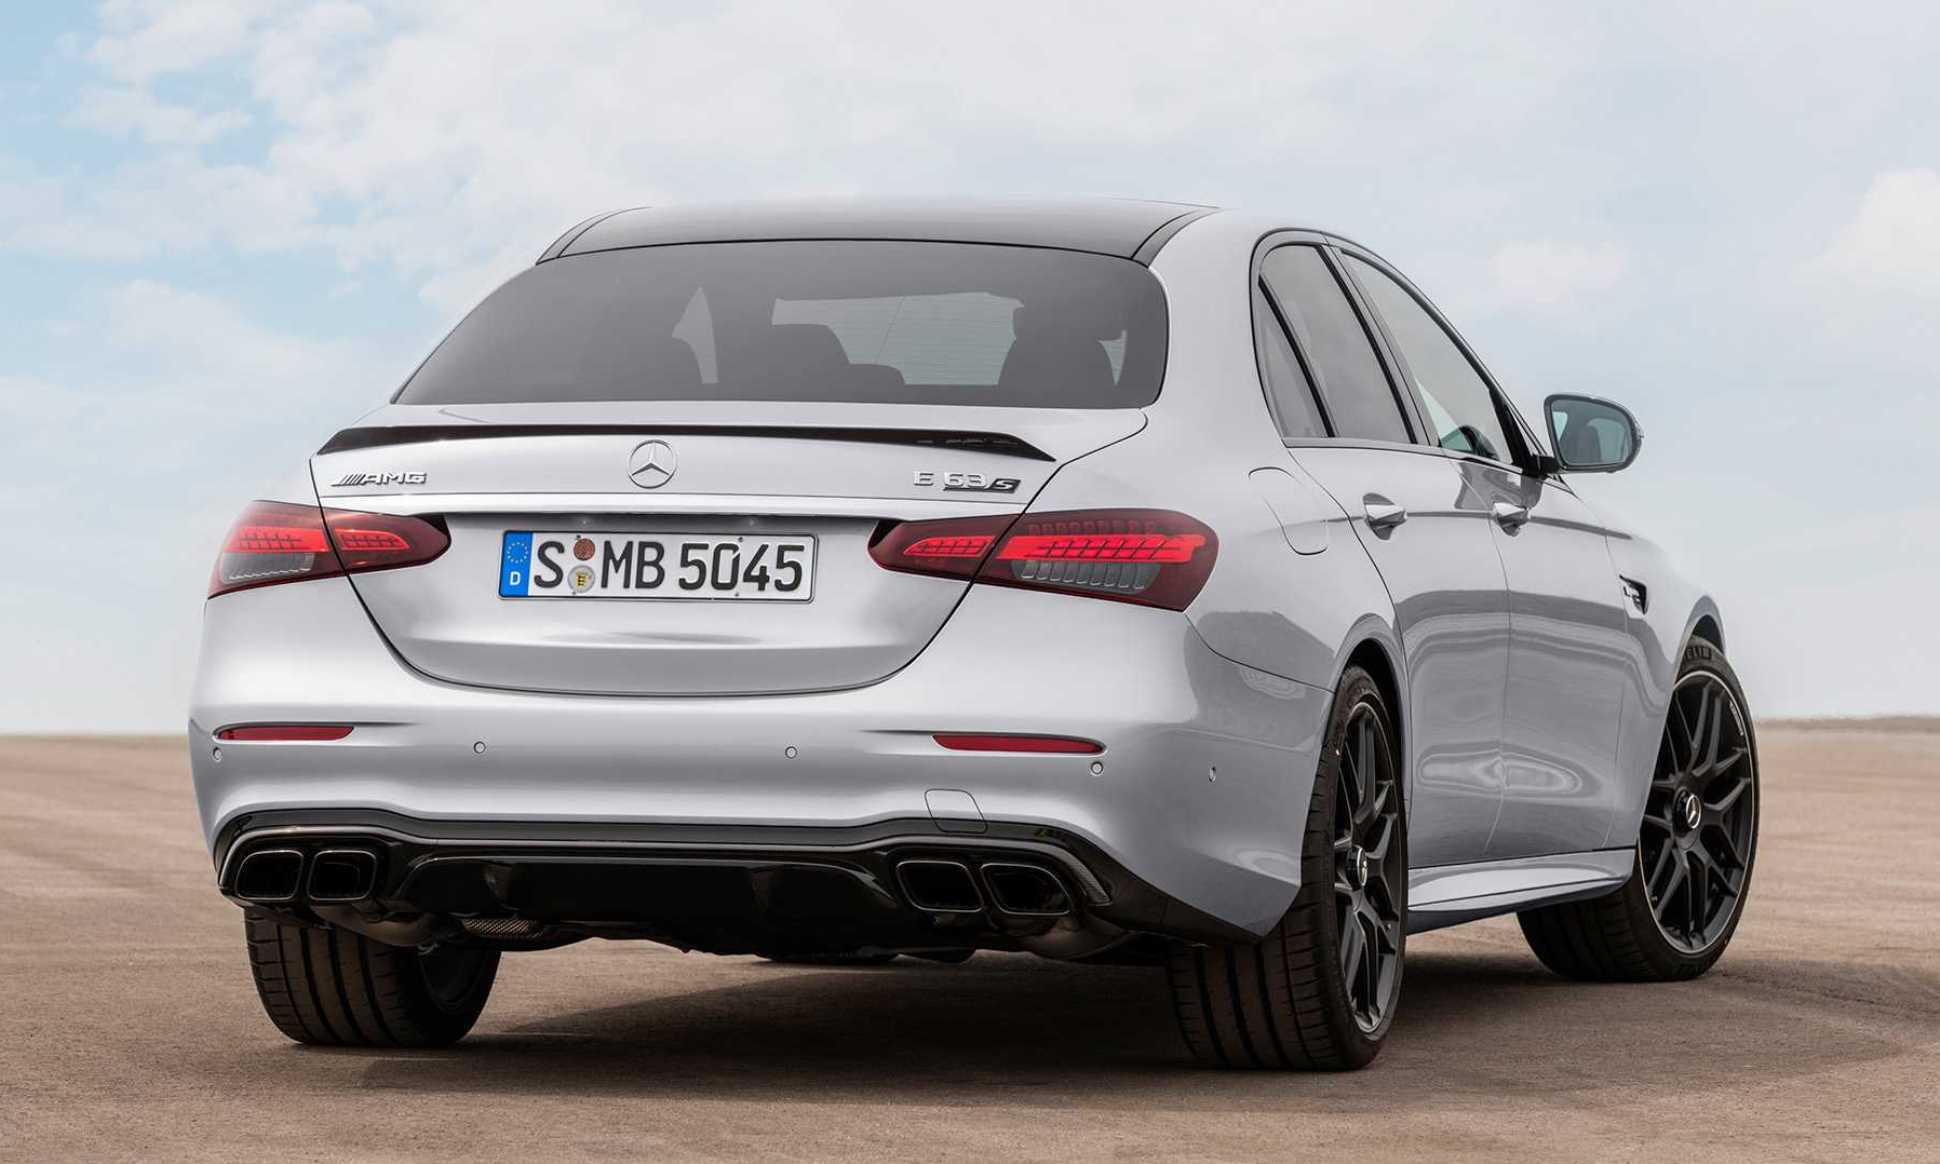 Mercedes-AMG E63S facelift rear